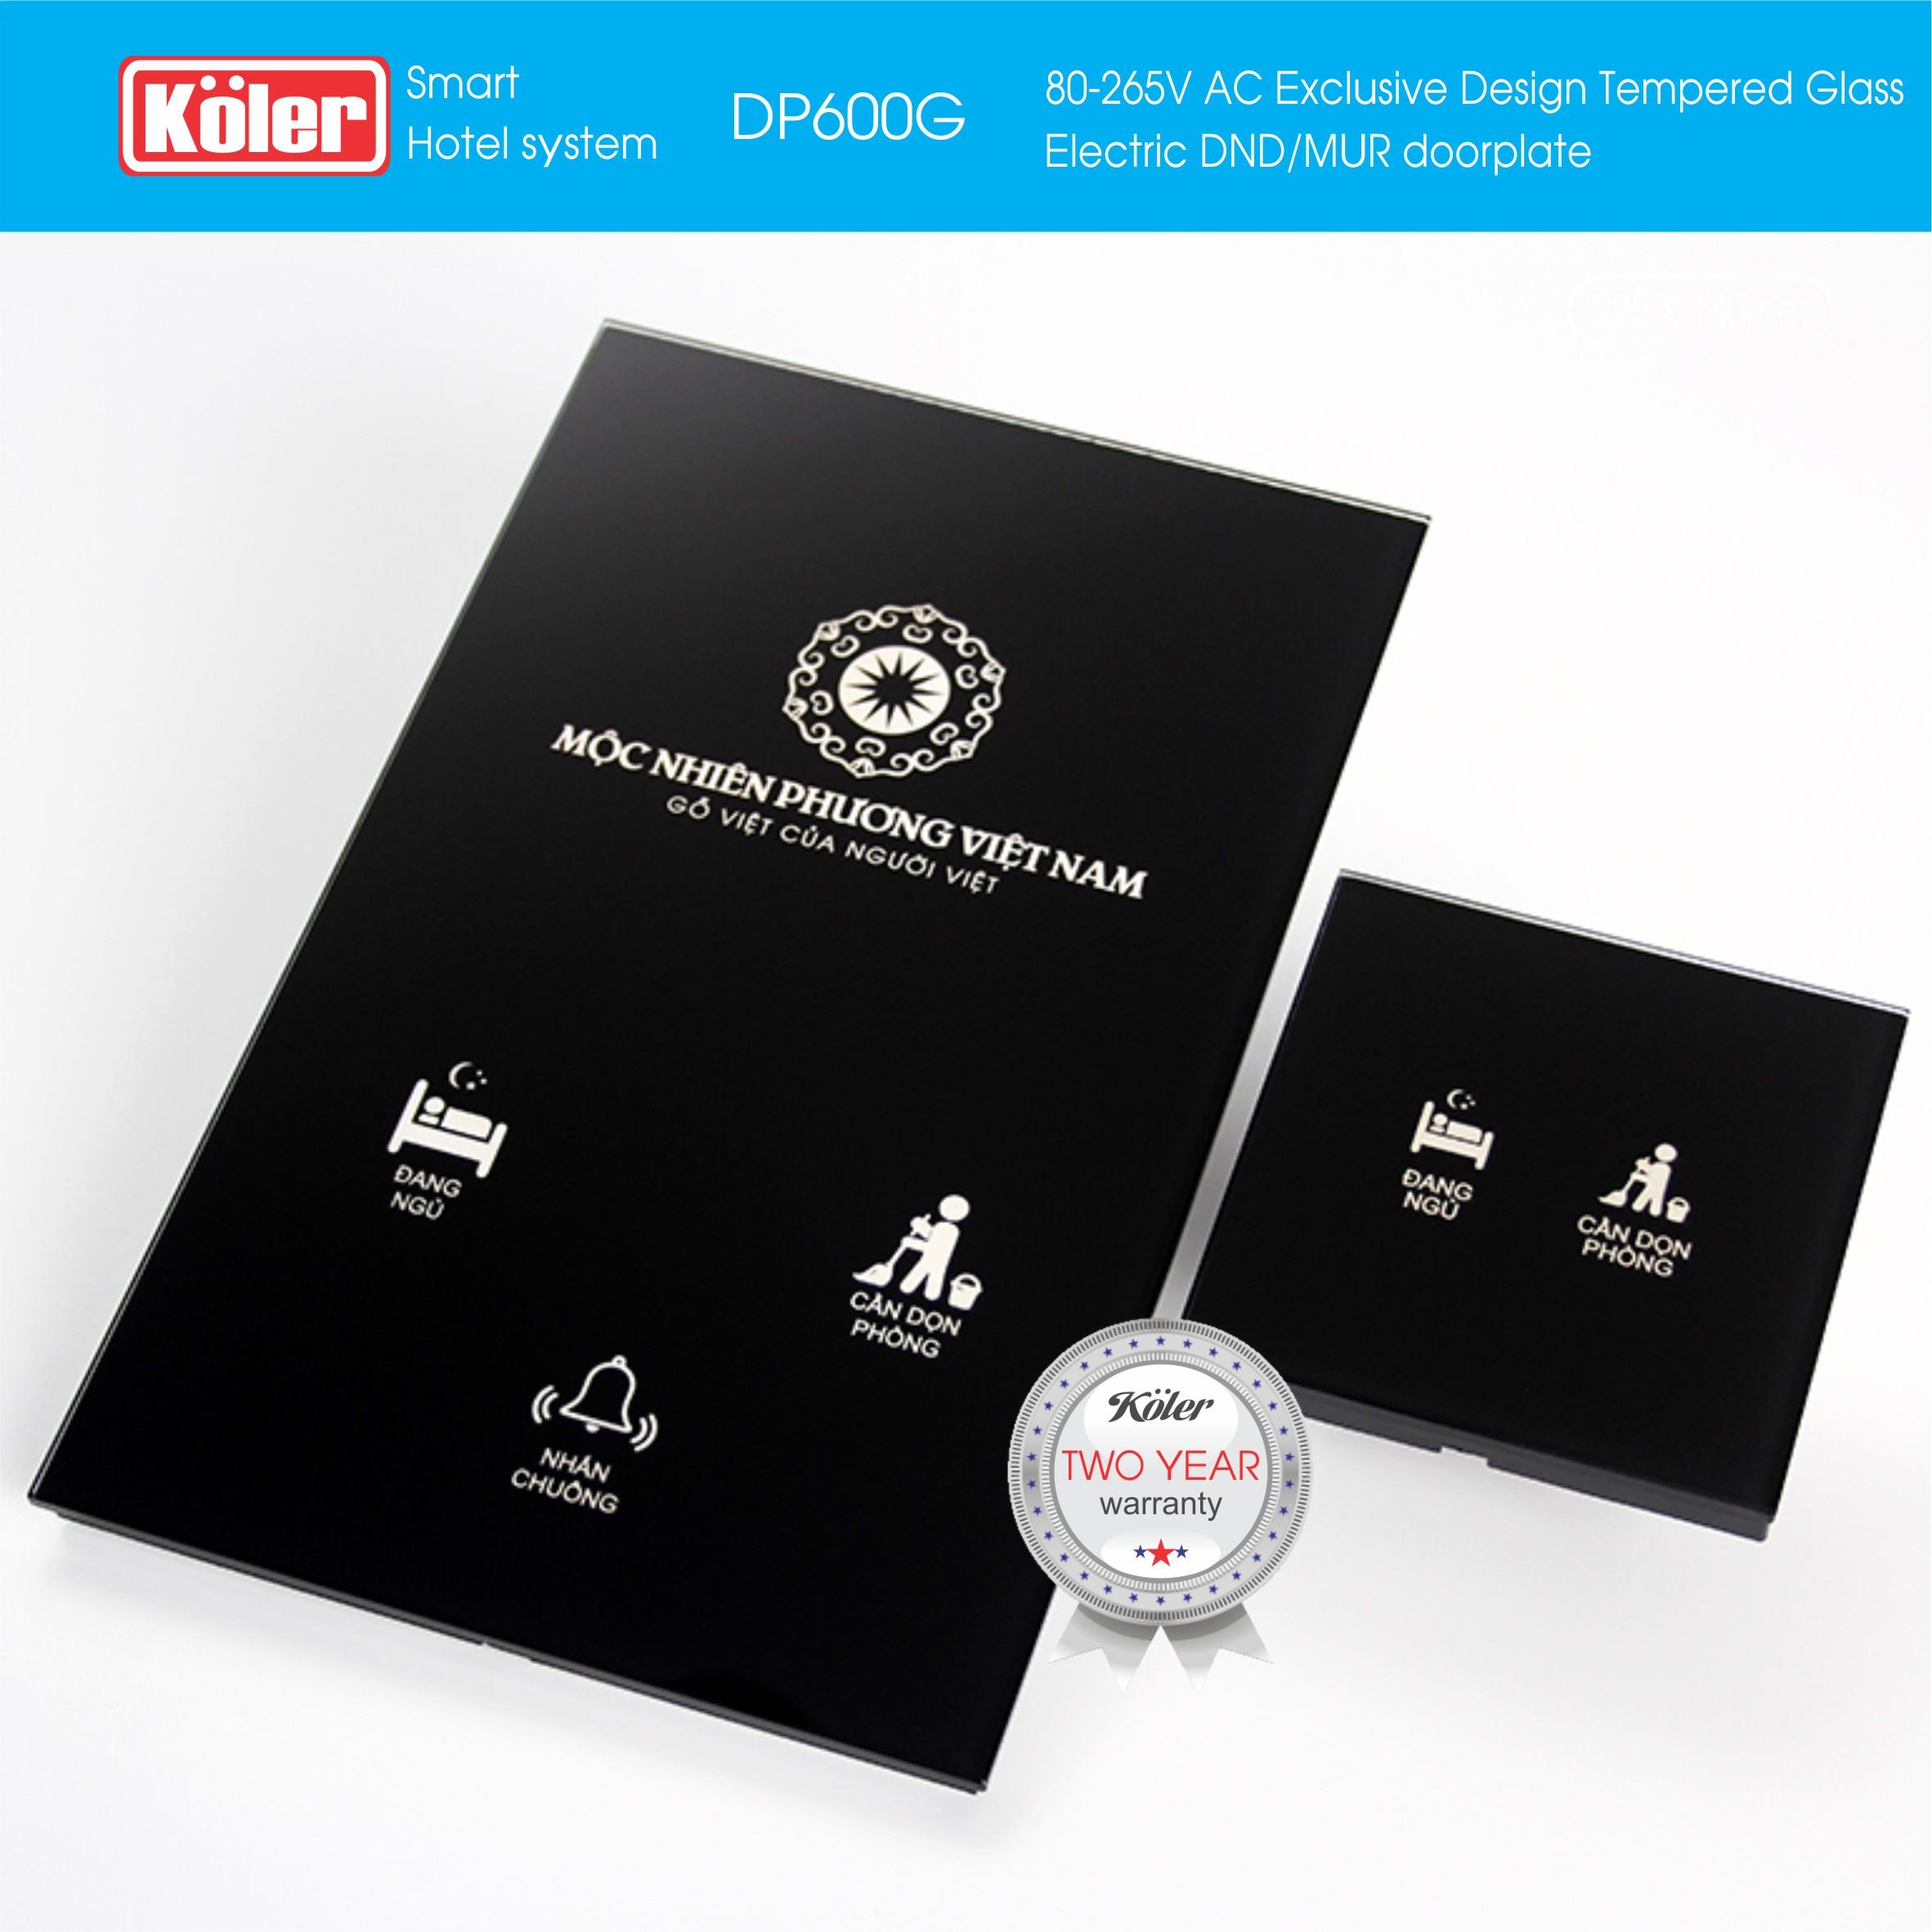 Doorplate Temper Glass LED DP700G